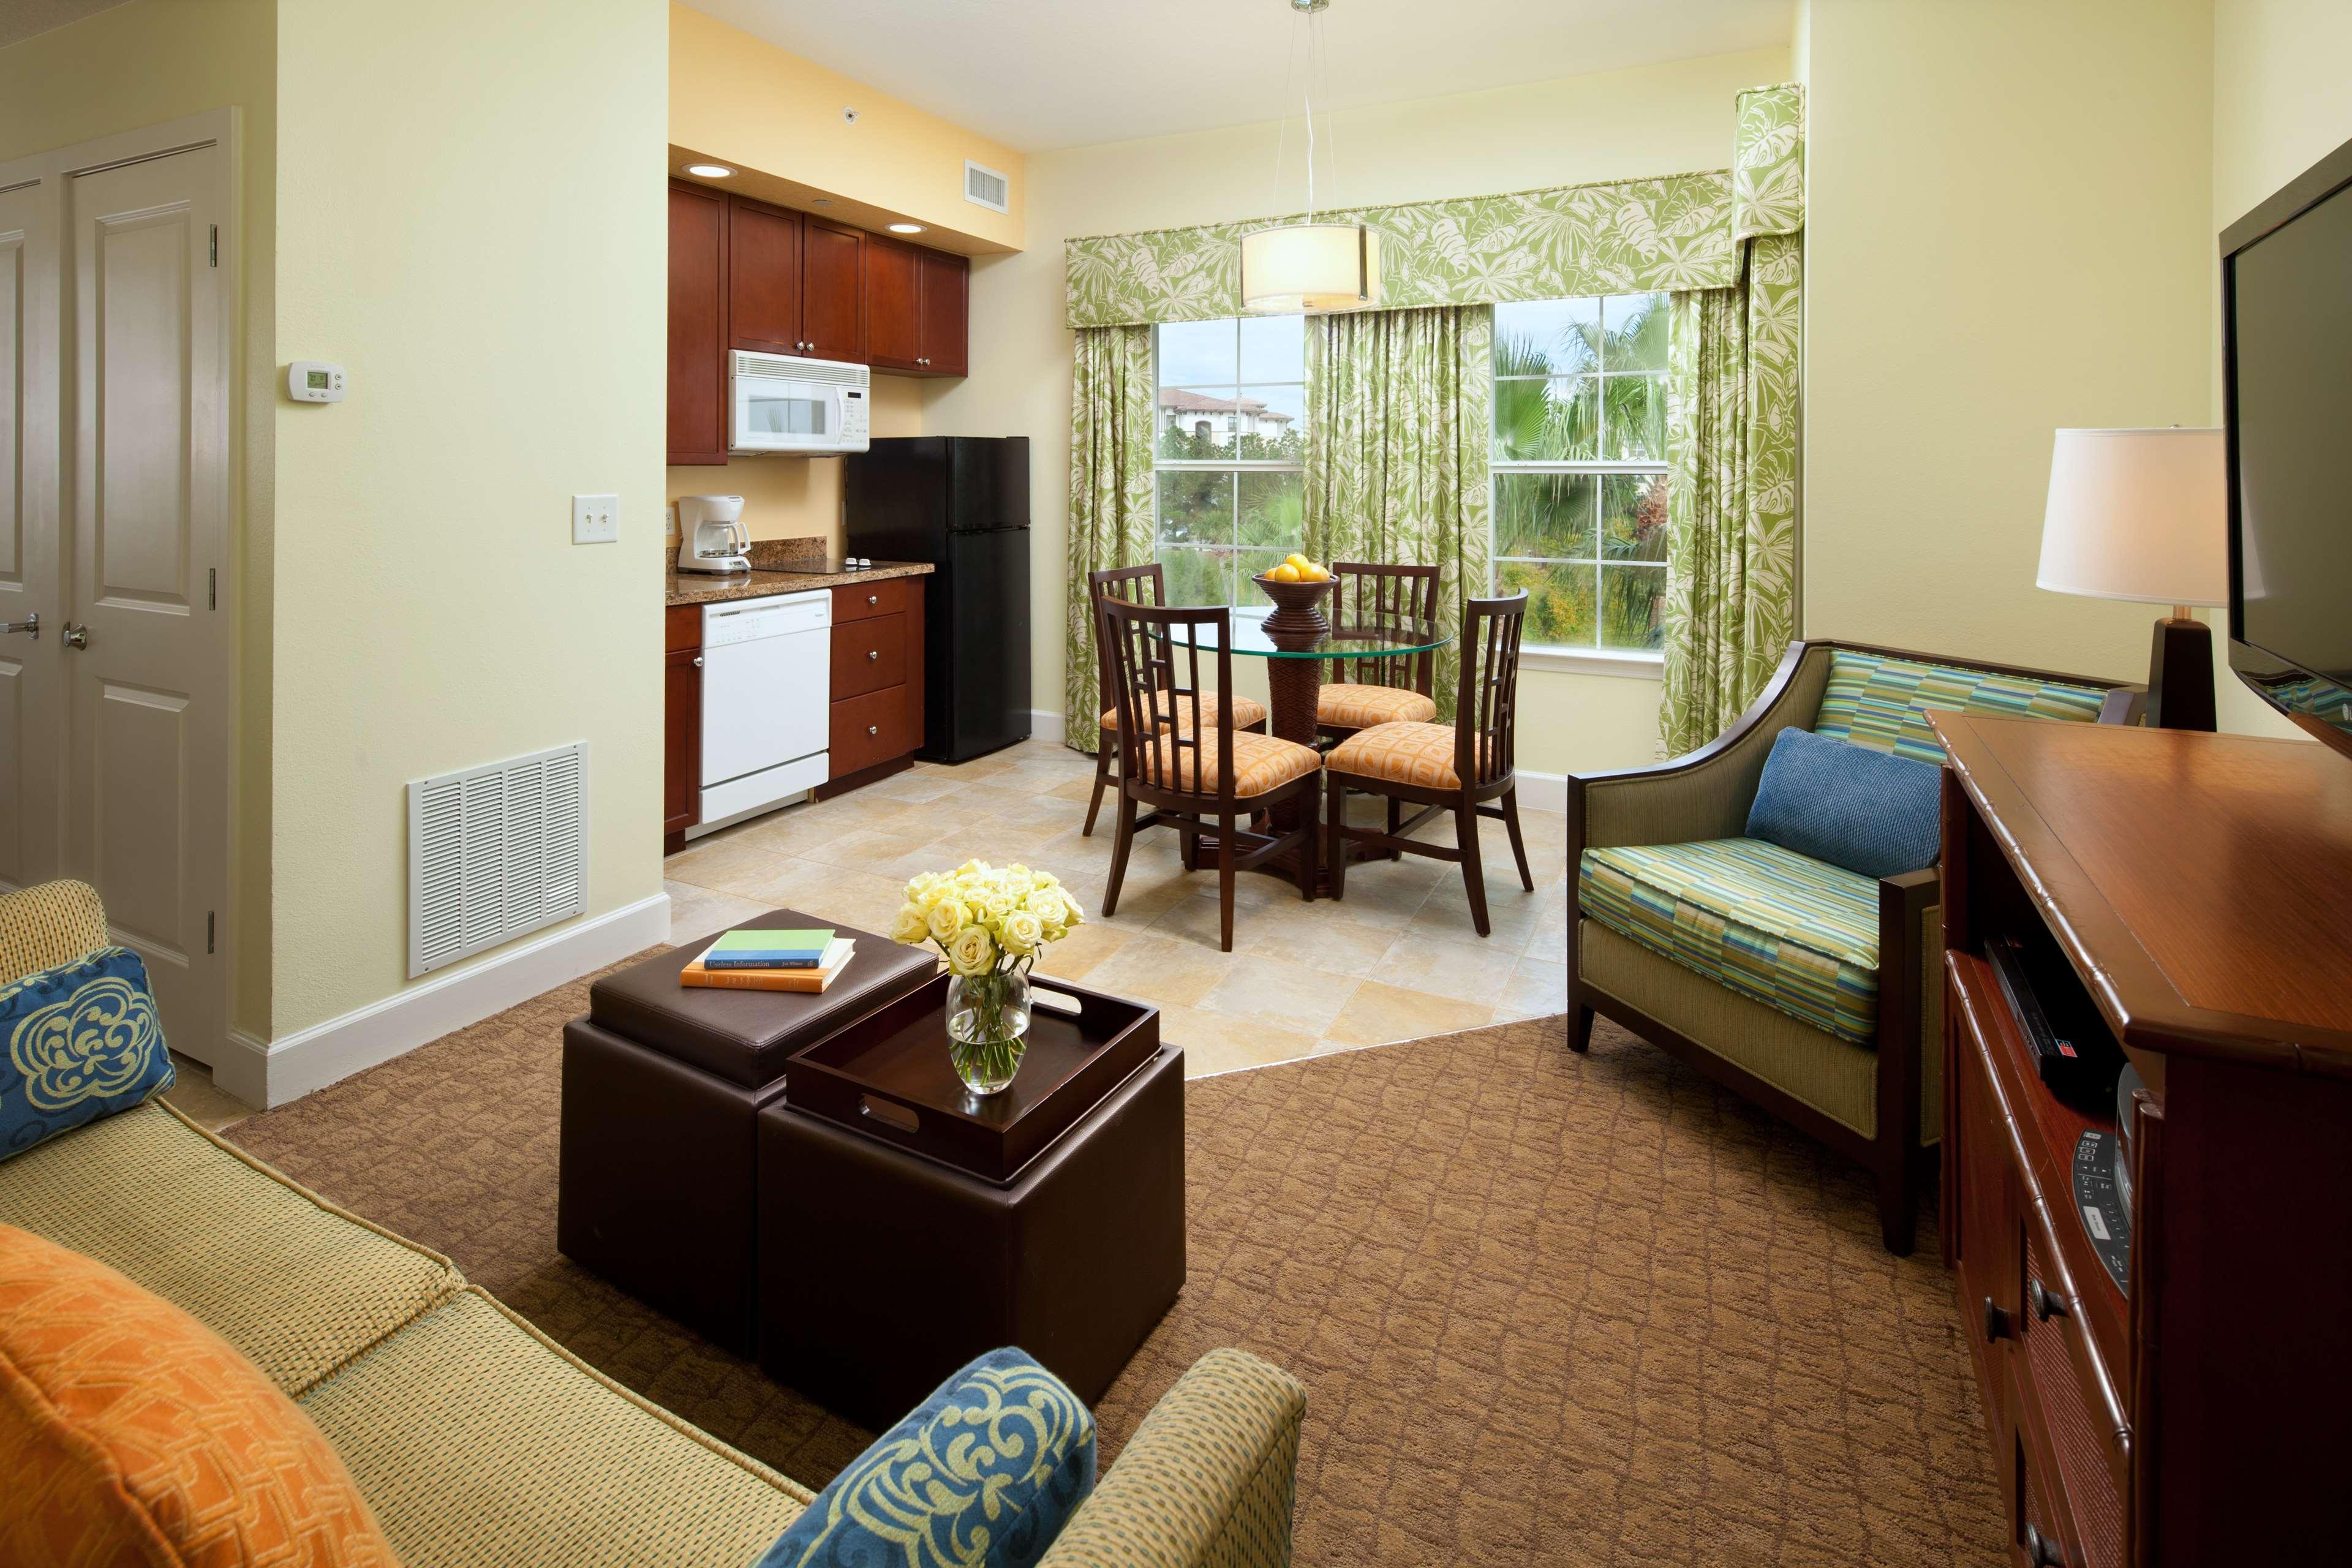 Key West Phase - Kitchen/Dining & Living Room - 3-bdrm lockoff villa, 2-bdrm villa, 2-bdrm lockoff villa, or 1-bdrm premium villa..